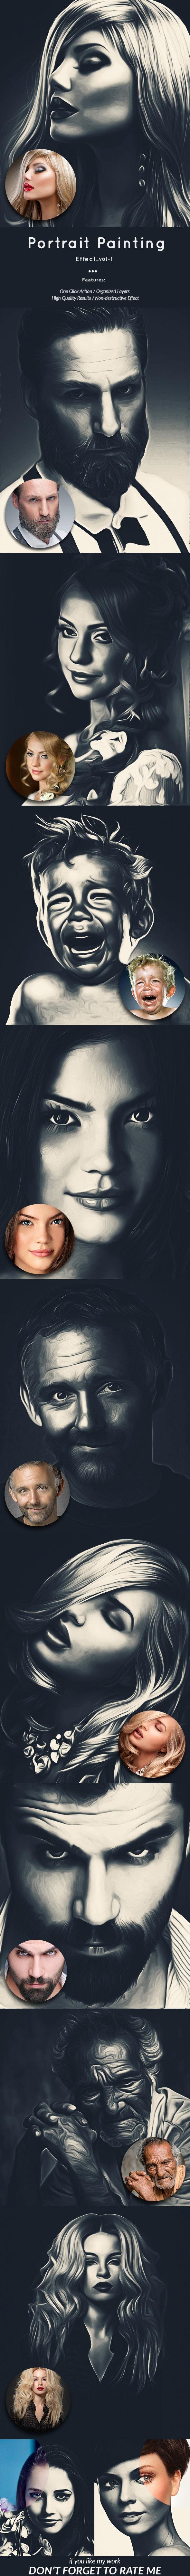 Portrait Painting Effect_vol-1 - Photo Effects Actions